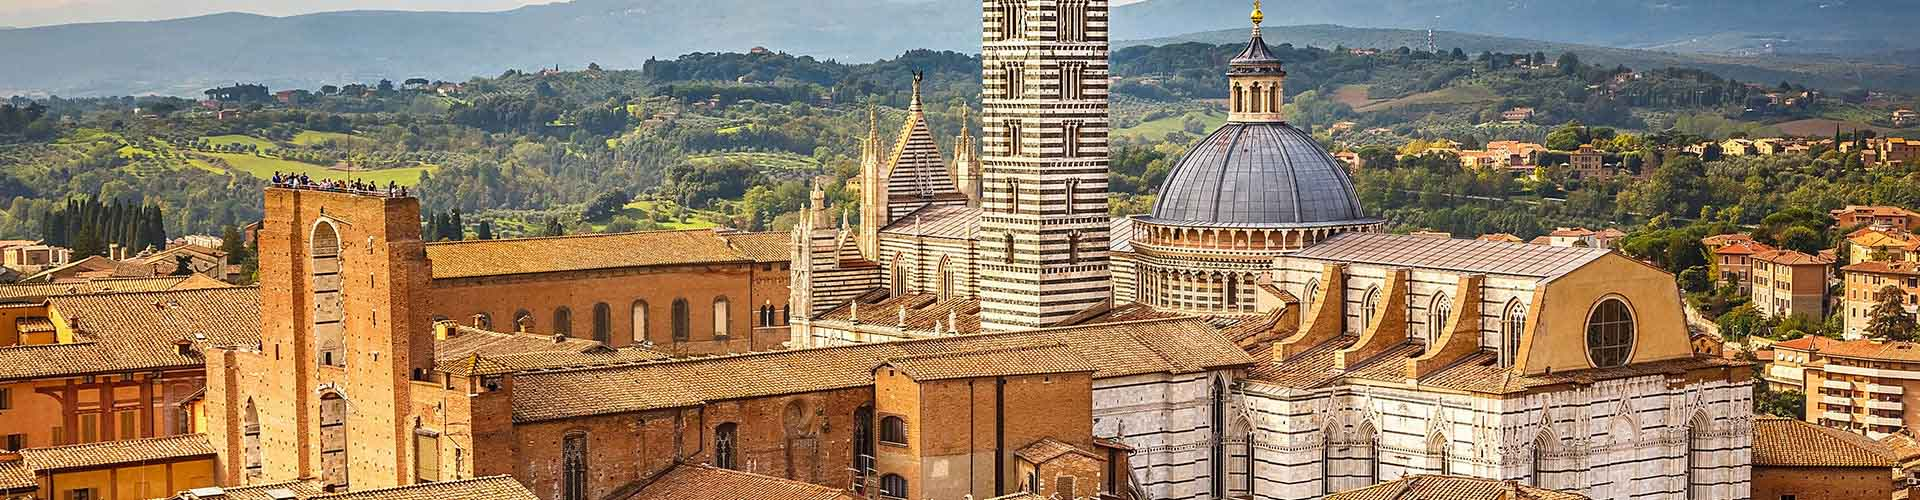 Siena – Ostelli a Siena. Mappe per Siena, Foto e  Recensioni per ogni Ostello a Siena.